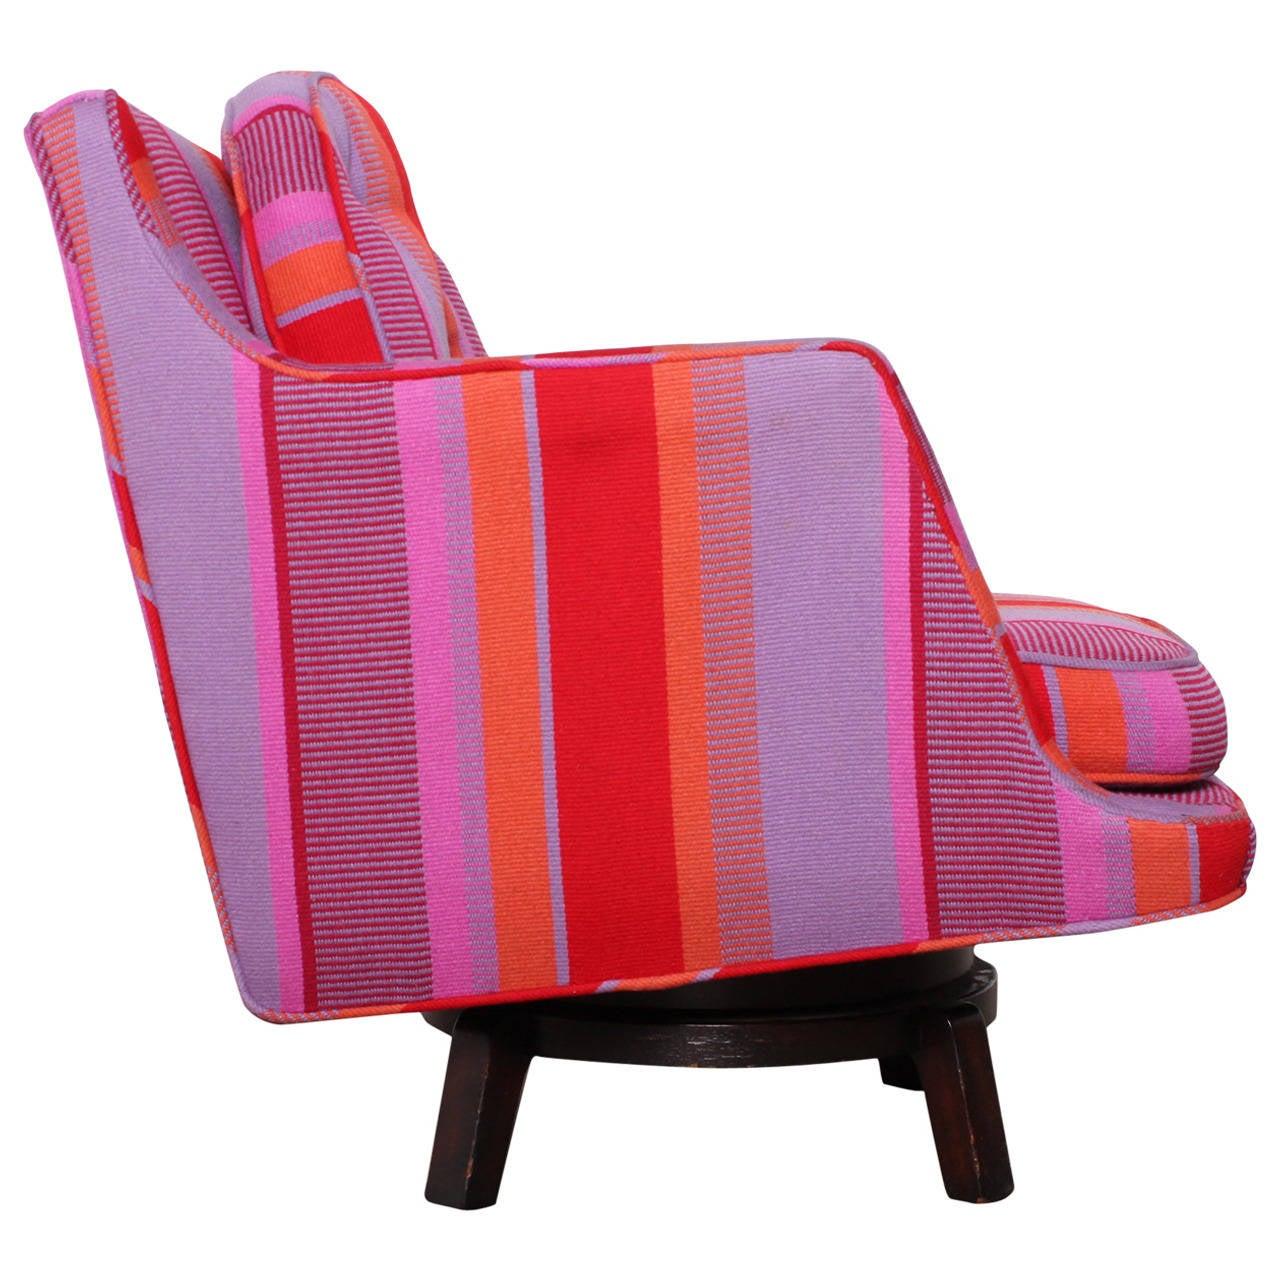 Swivel Lounge Chair by Edward Wormley for Dunbar